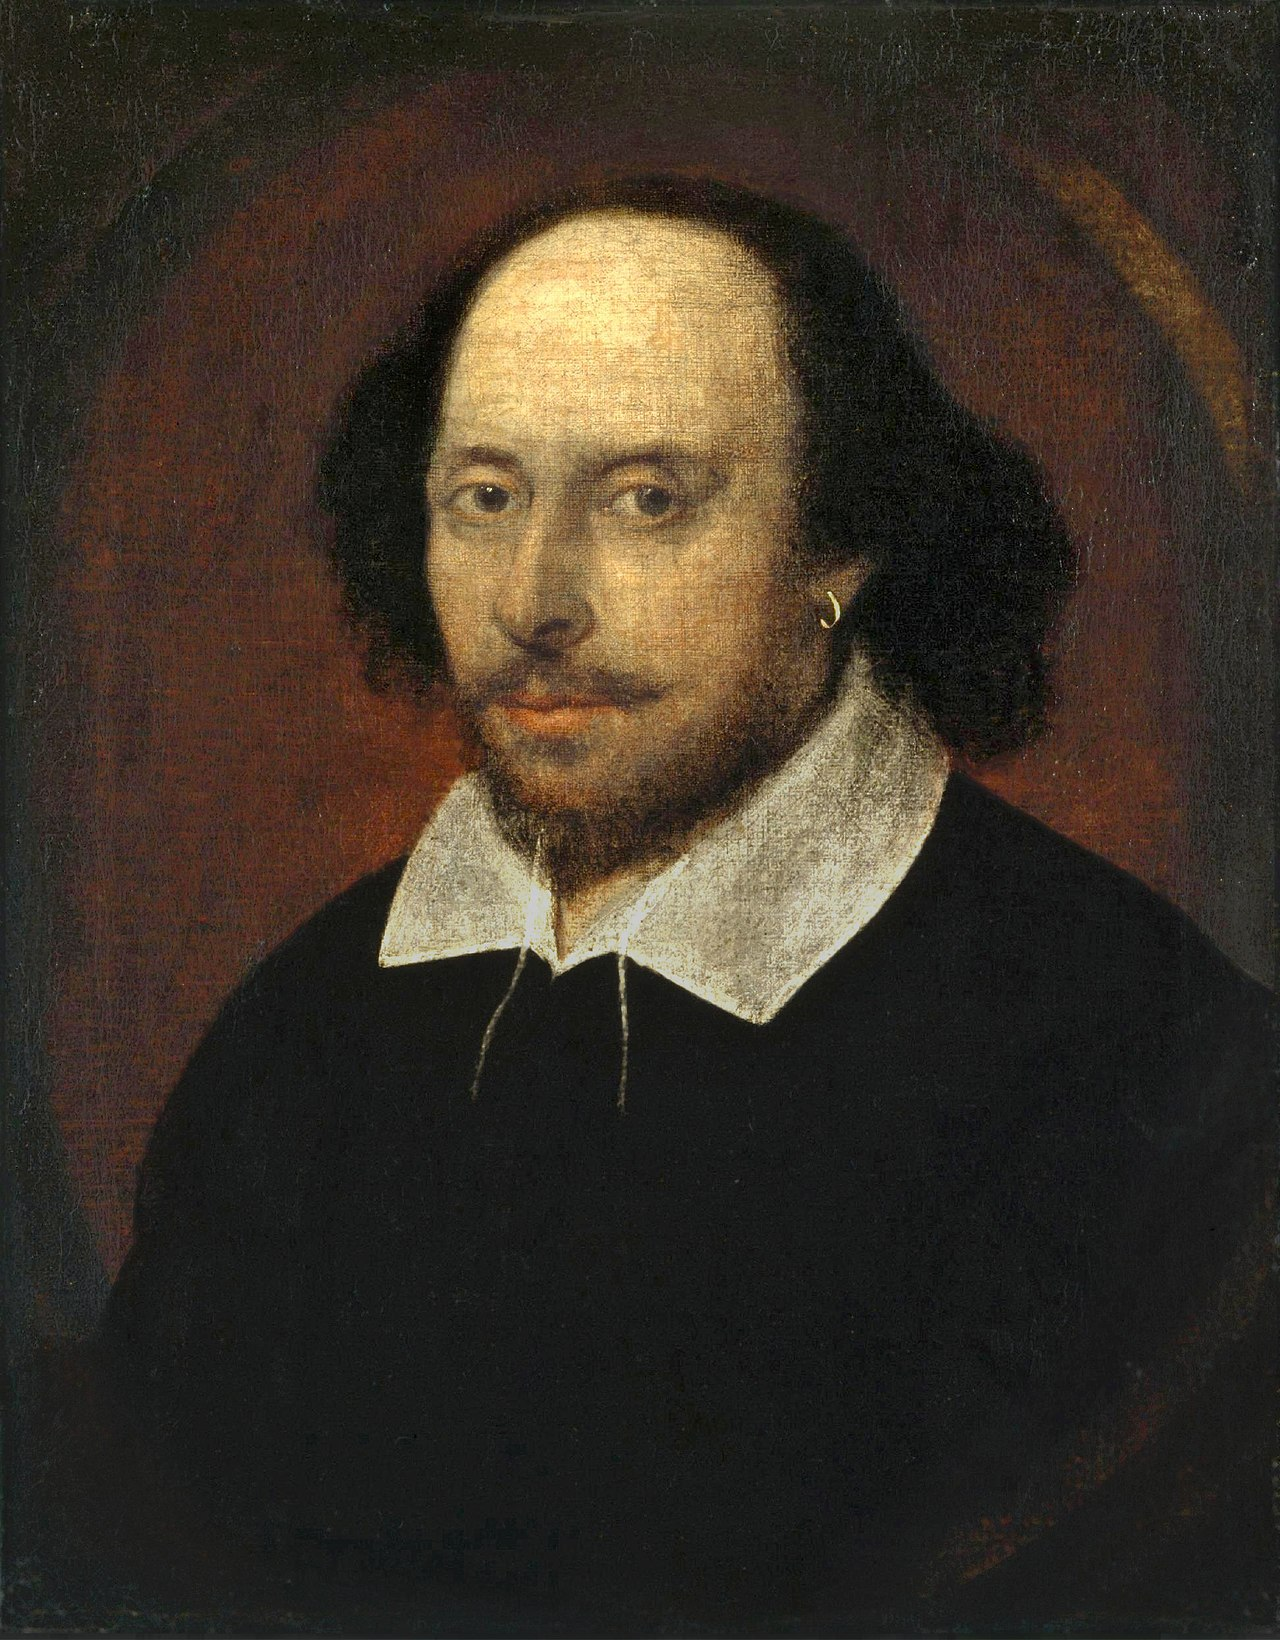 The Chandos portrait